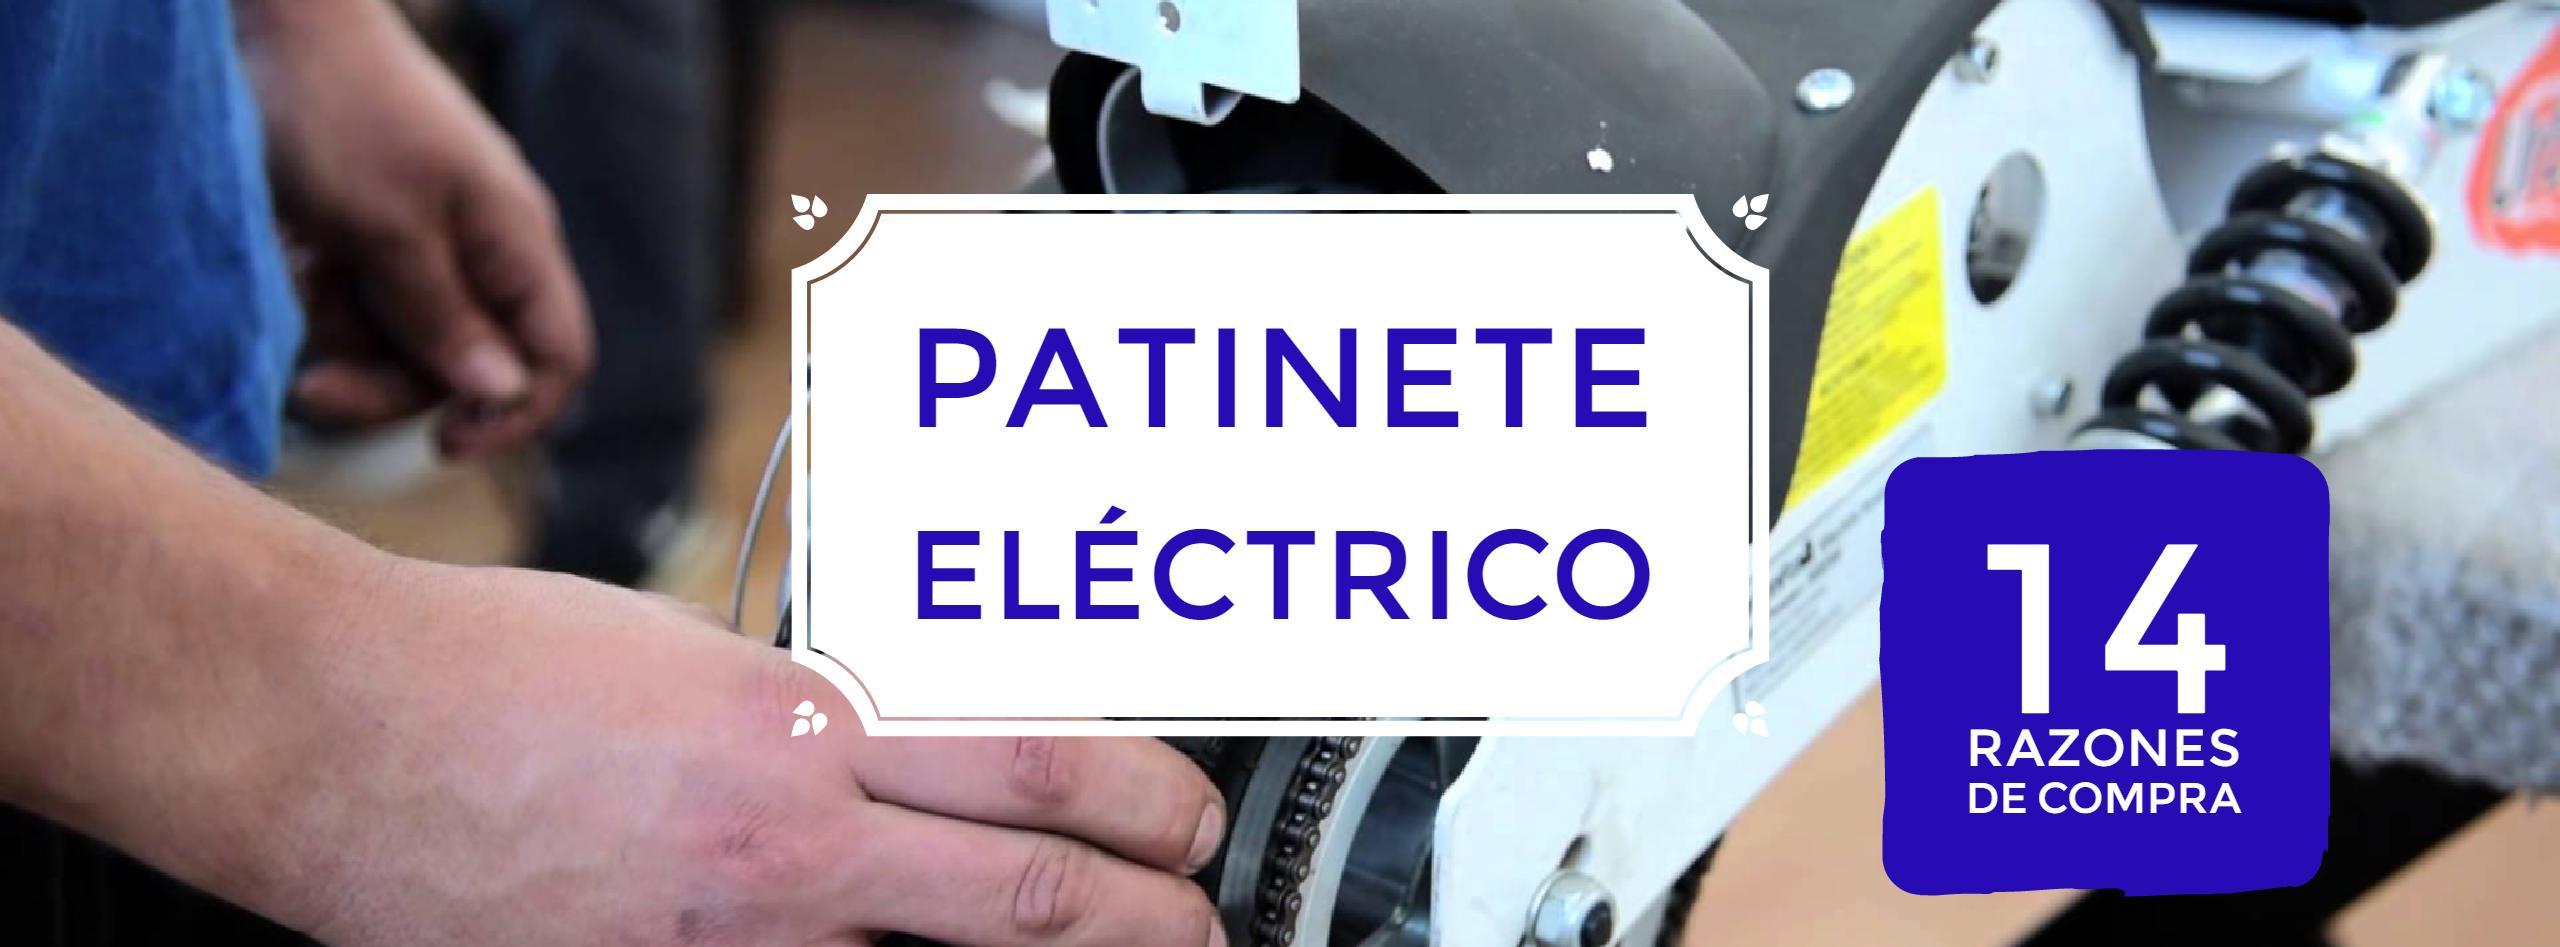 - Patinetes eléctricos